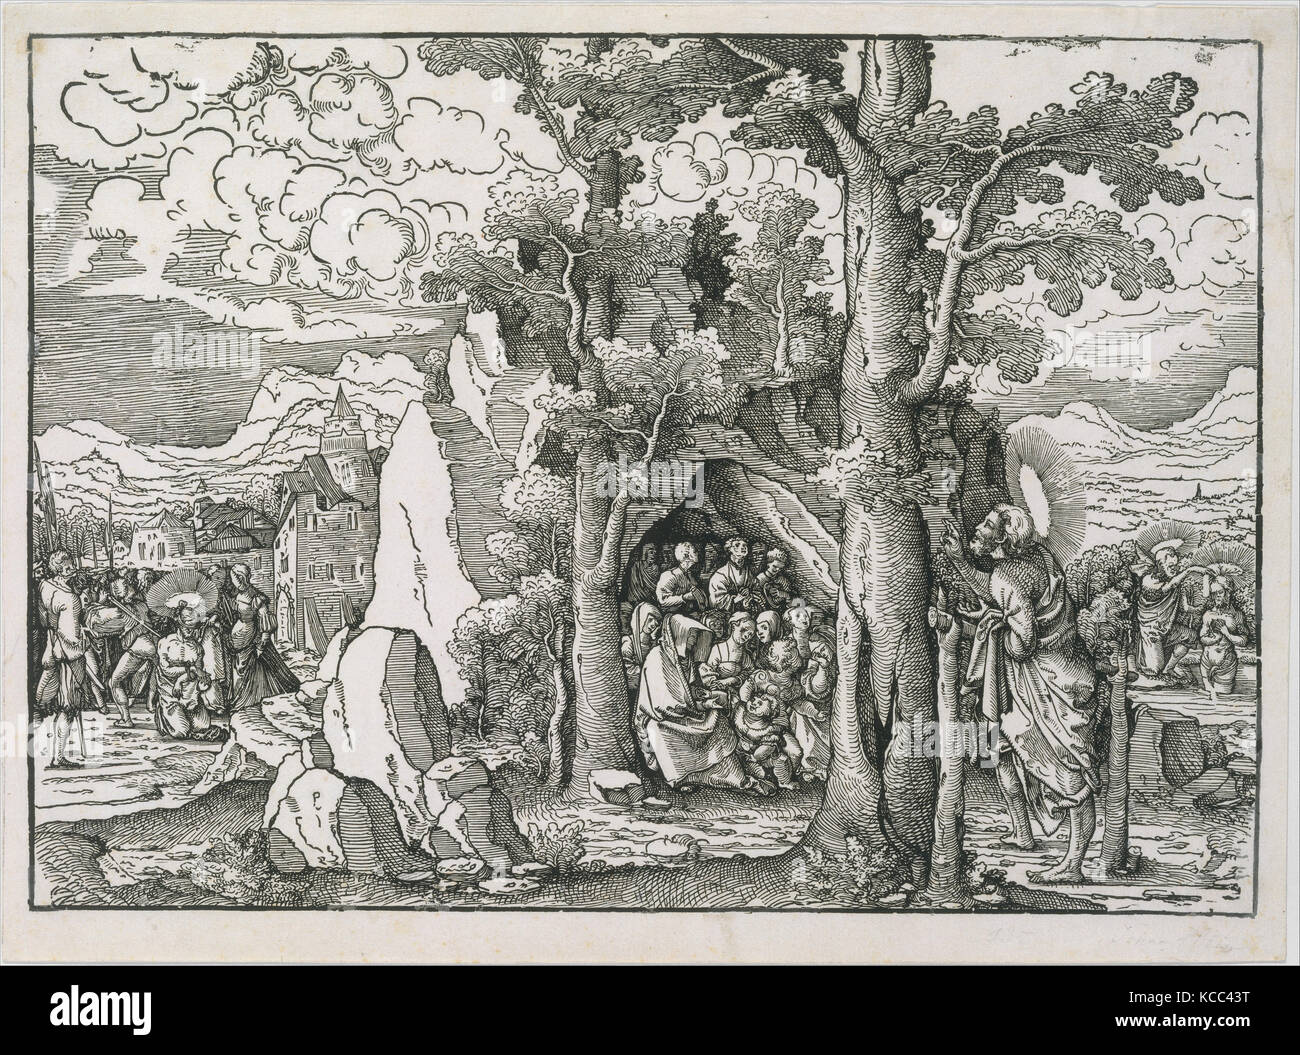 Scenes from the Life of Saint John the Baptist, Frans Crabbe van Espleghem, ca. 1522 - Stock Image